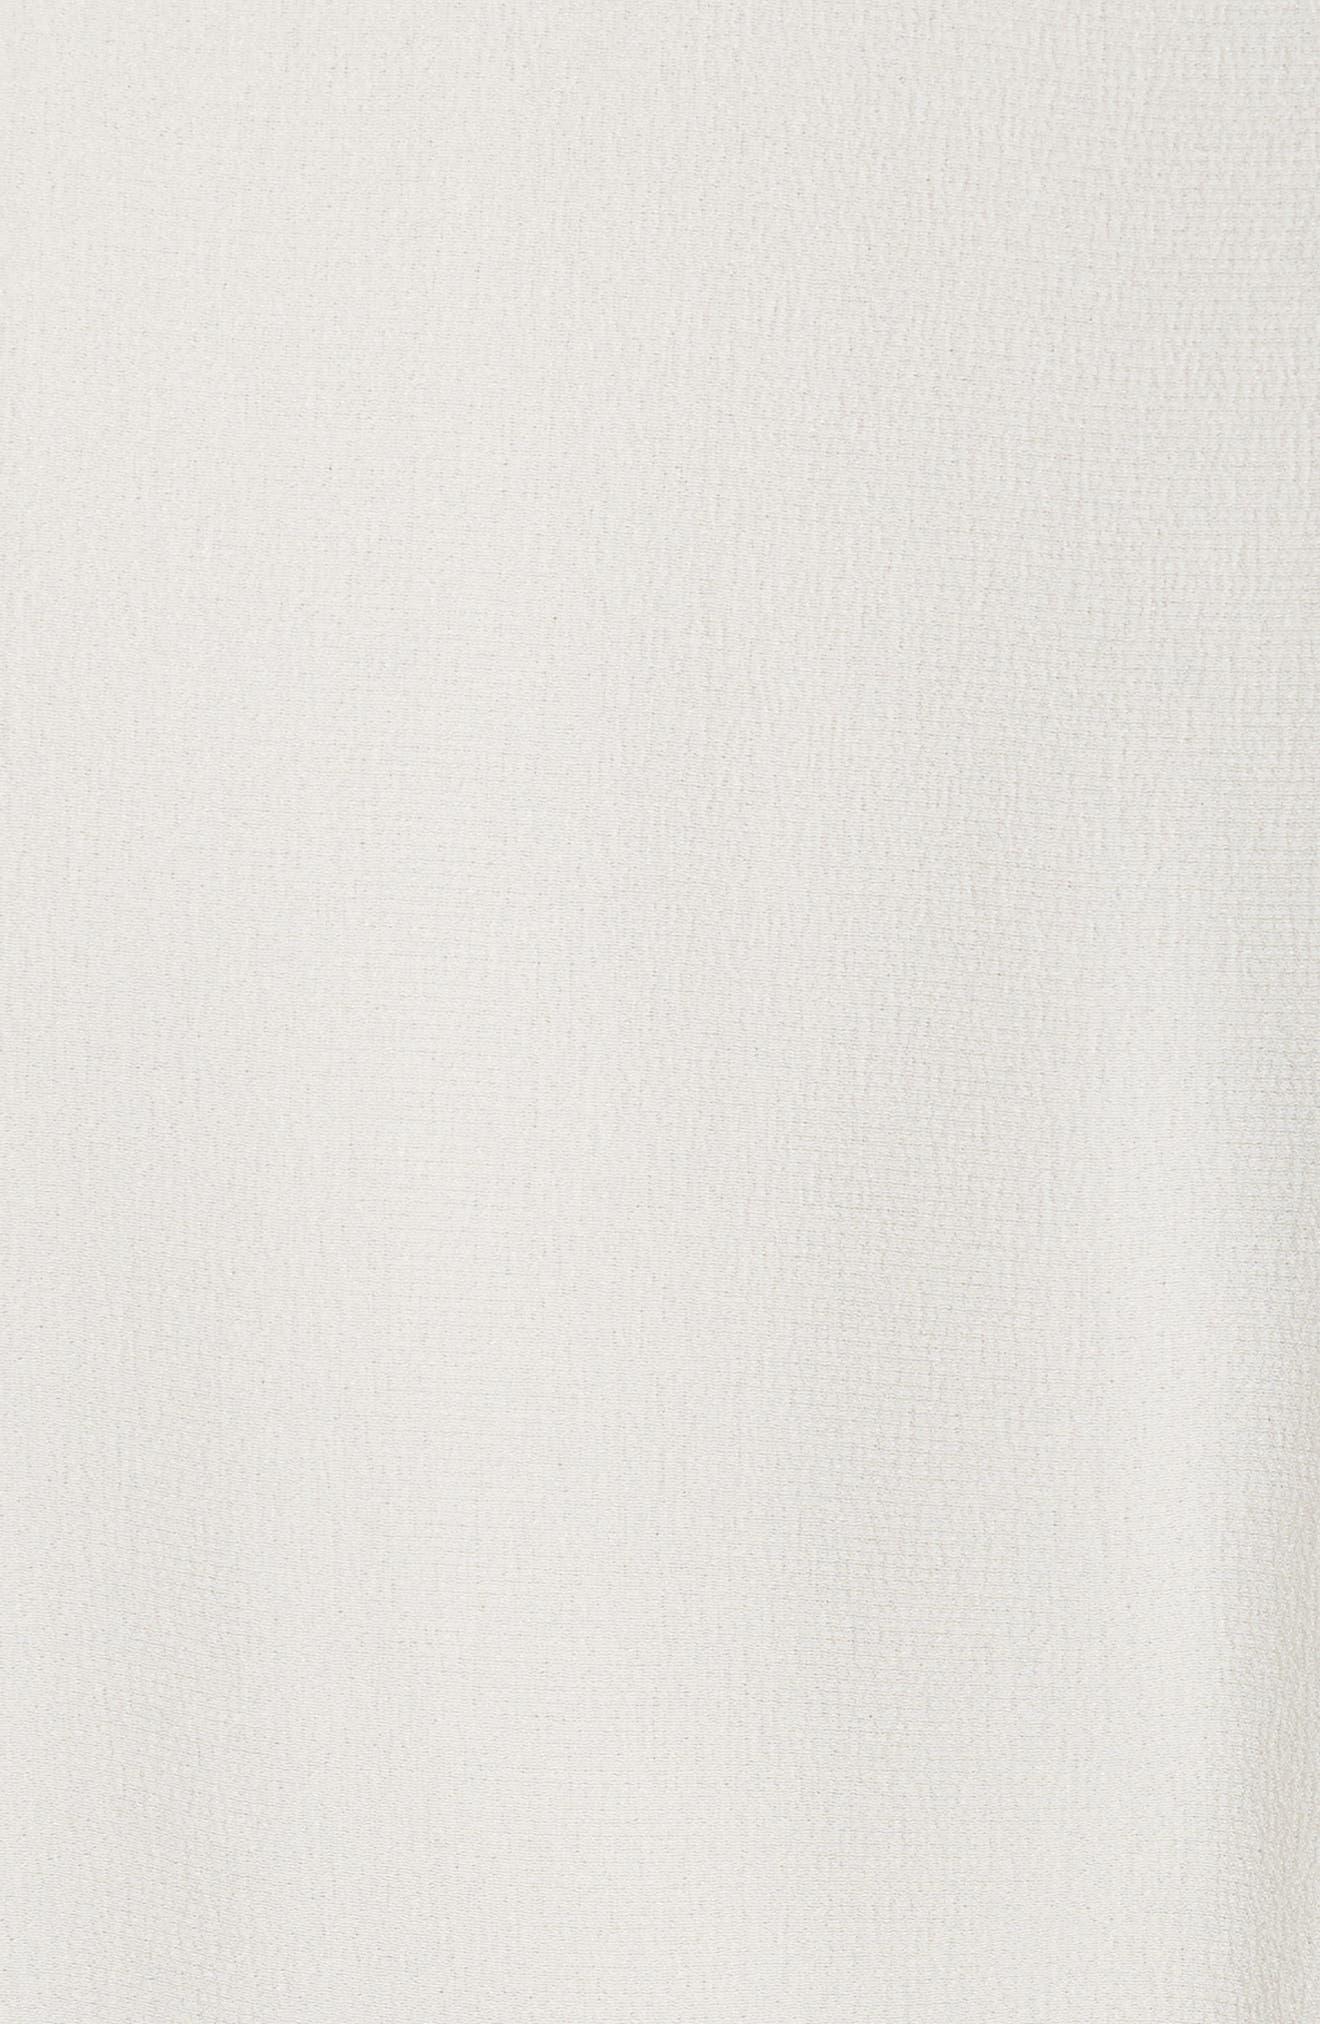 Slit Sleeve Silk Blouse,                             Alternate thumbnail 5, color,                             Antique White